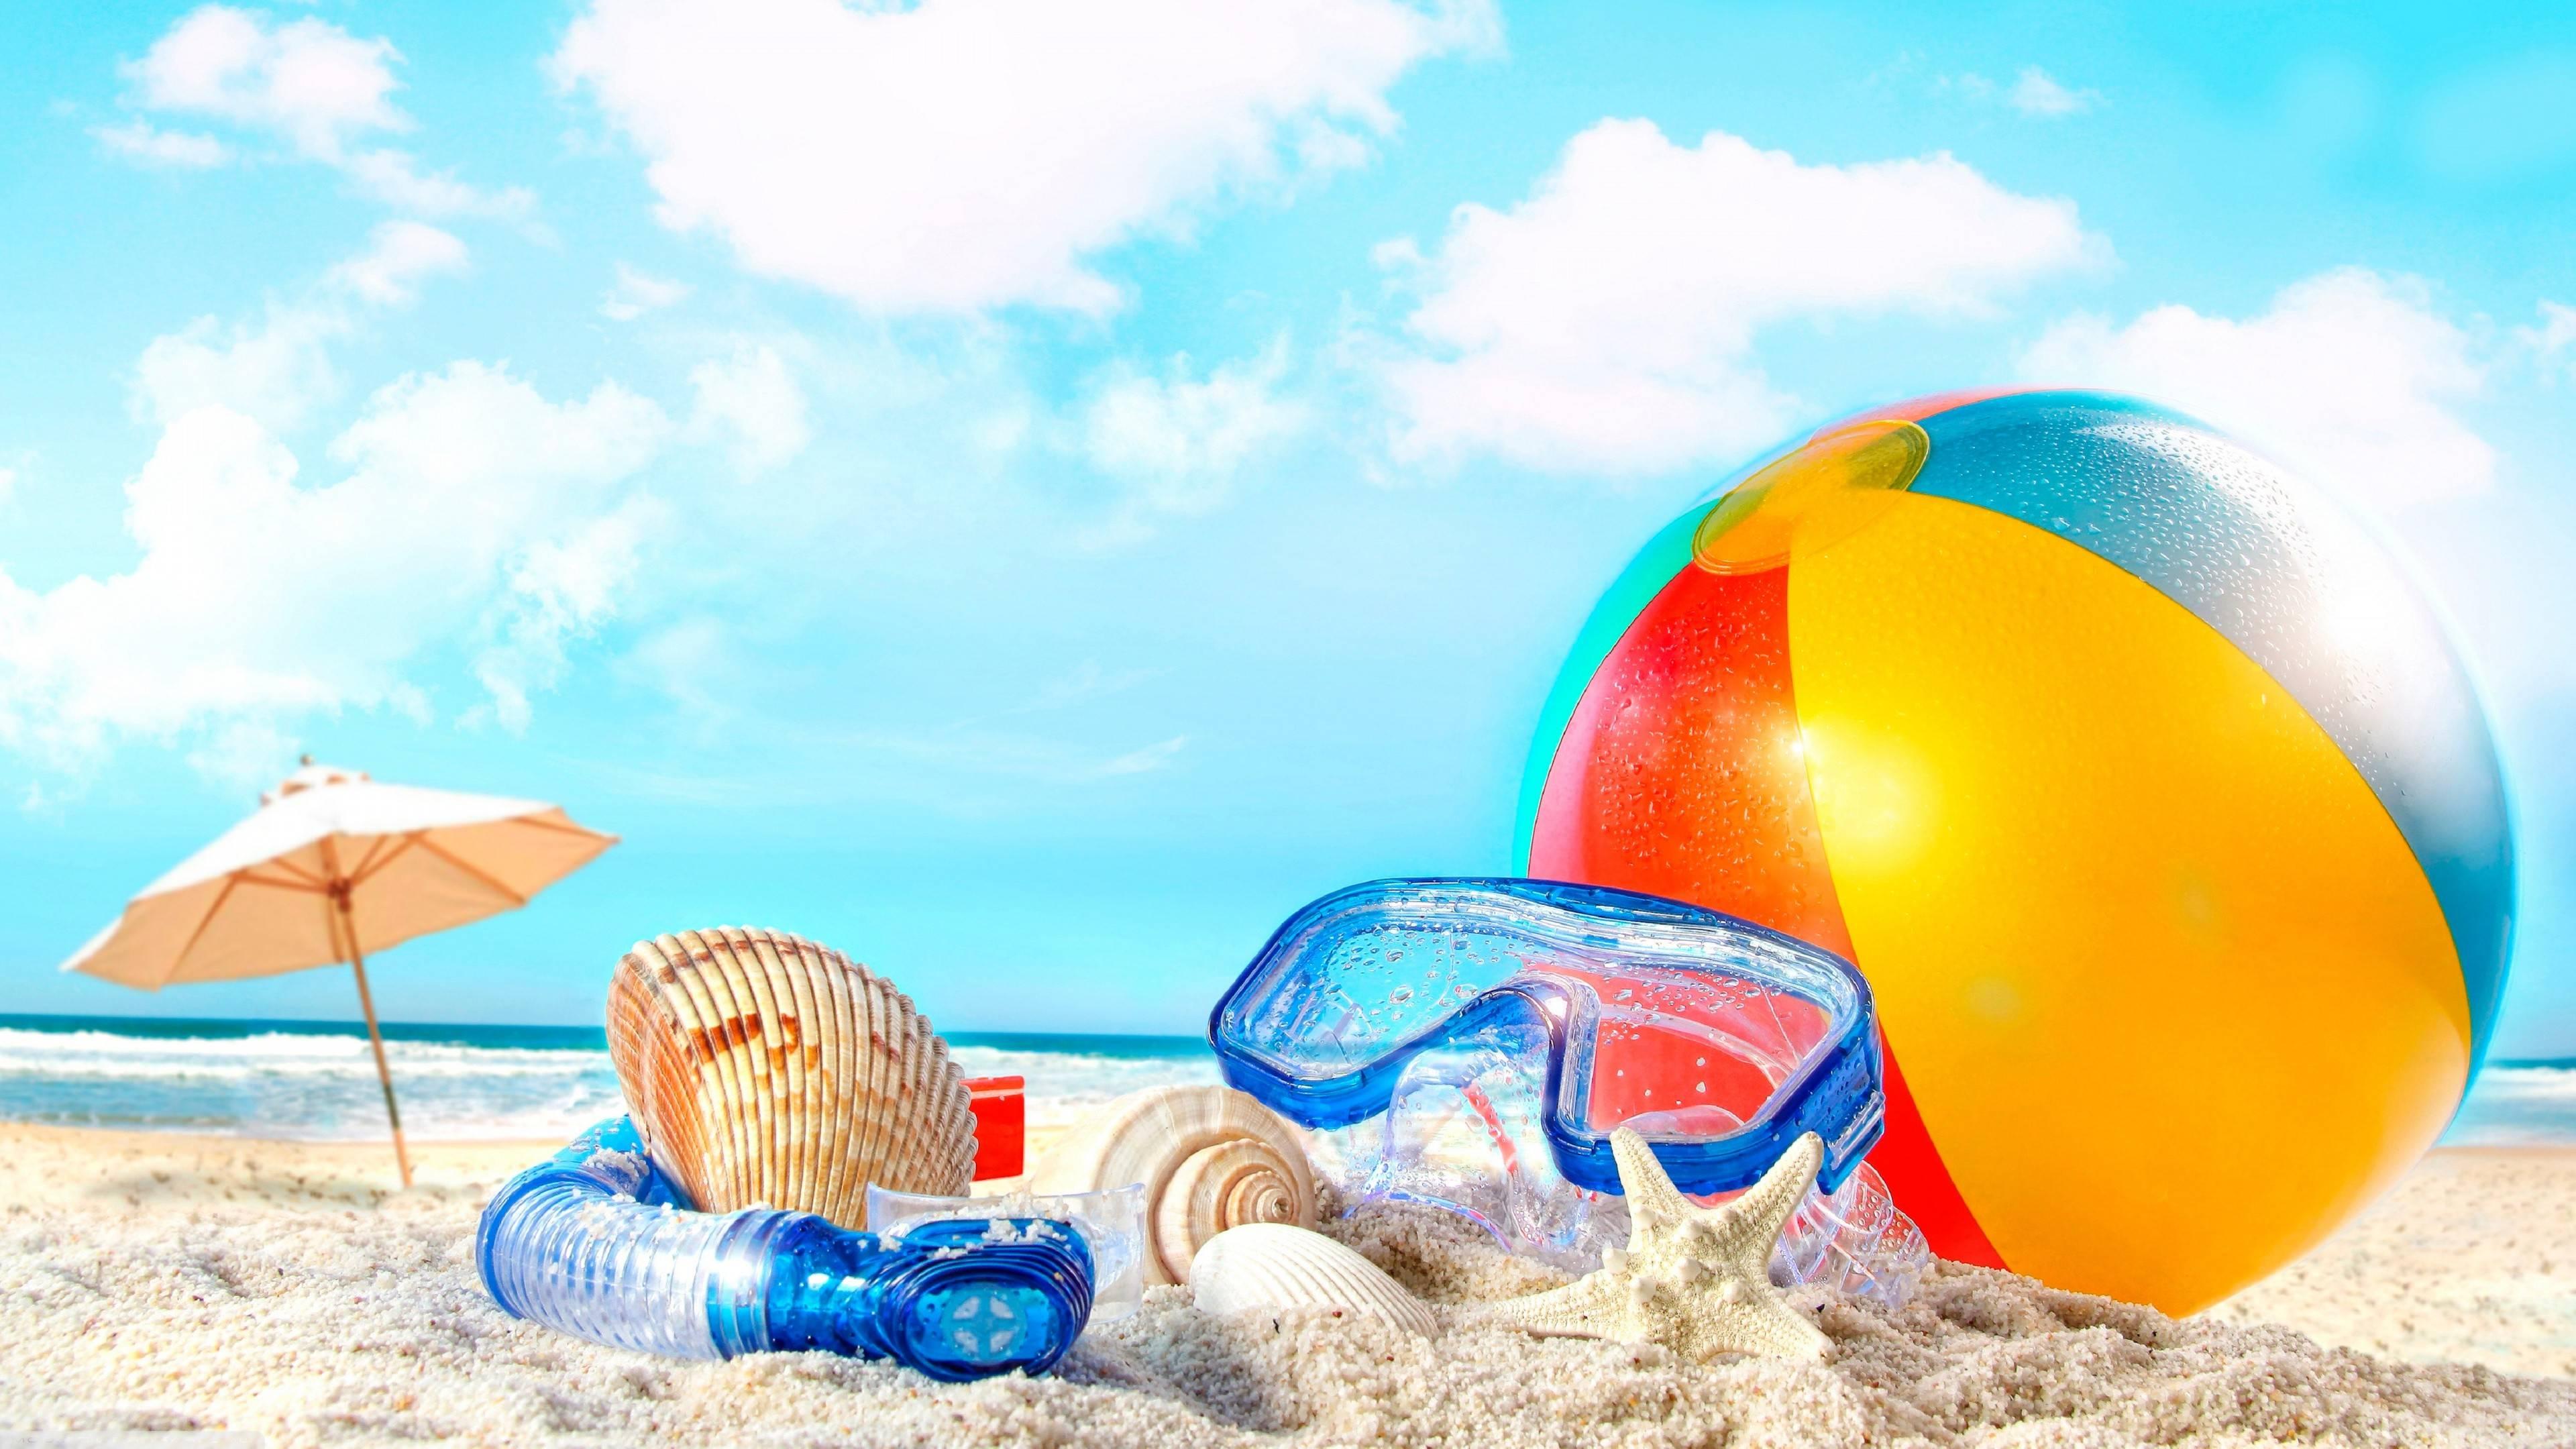 Summer Background Pics 3840x2160